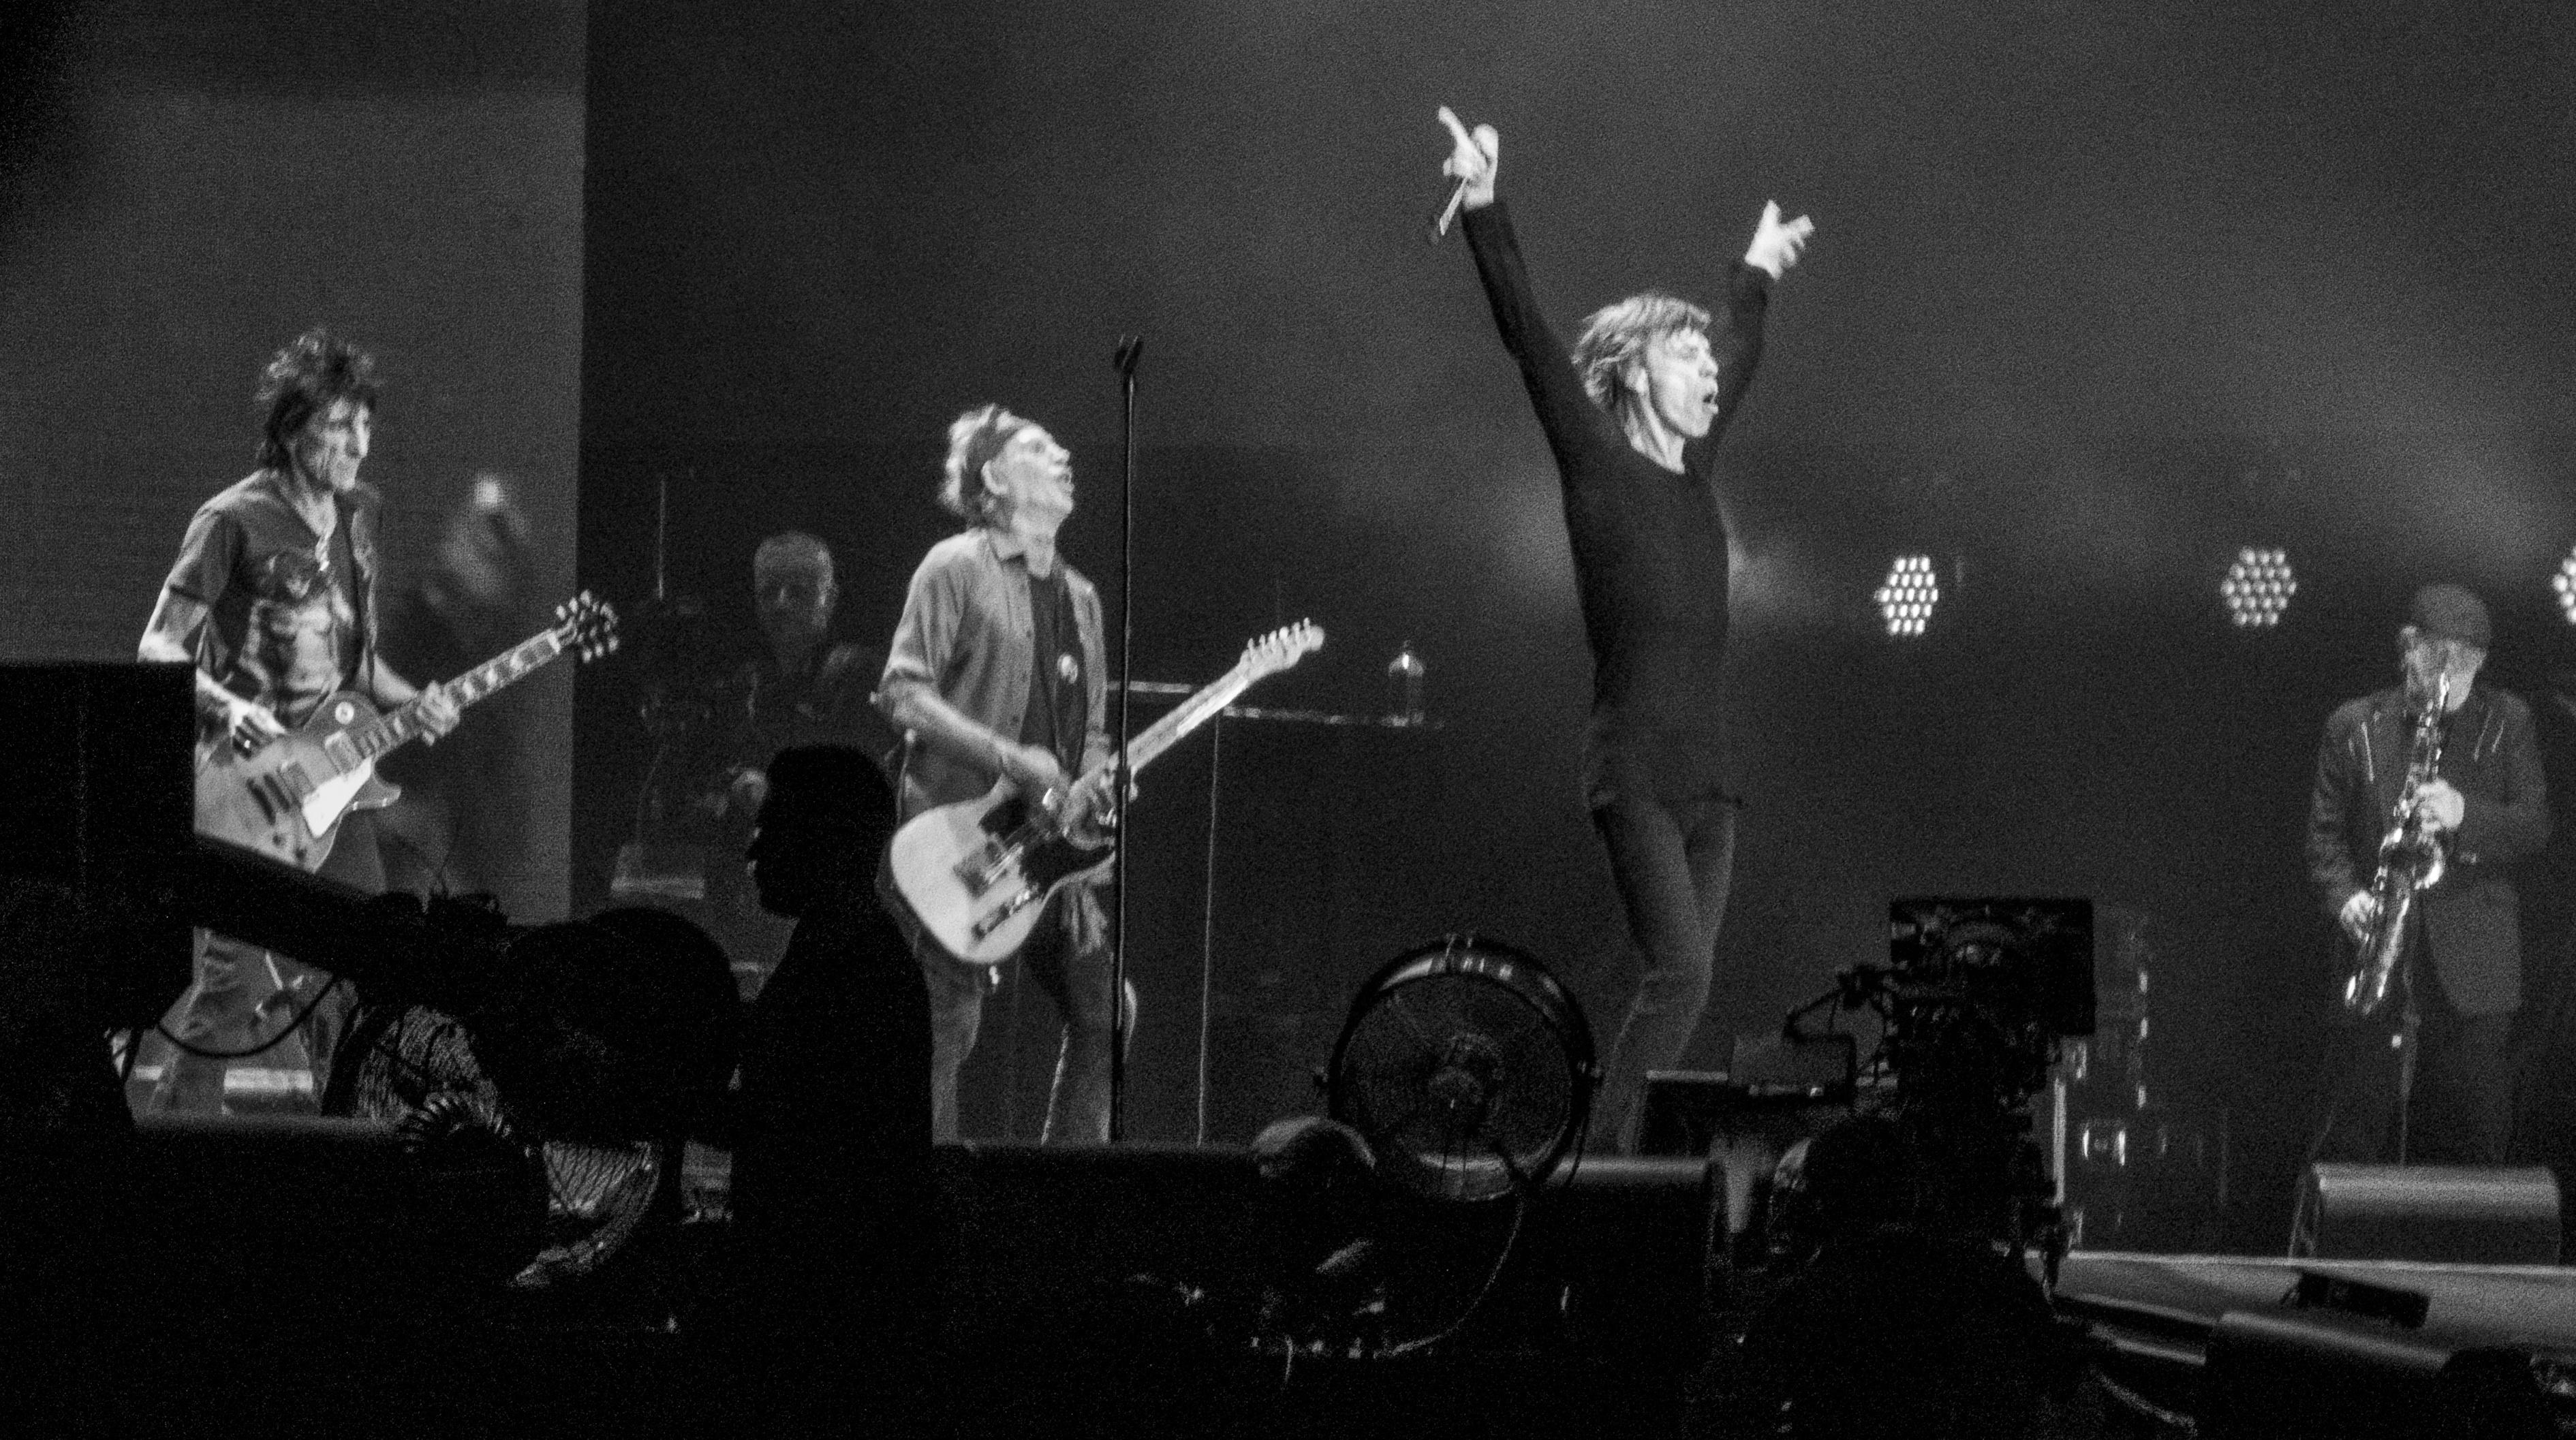 Rolling_Stones_in_Hyde_Park_(2013).jpg